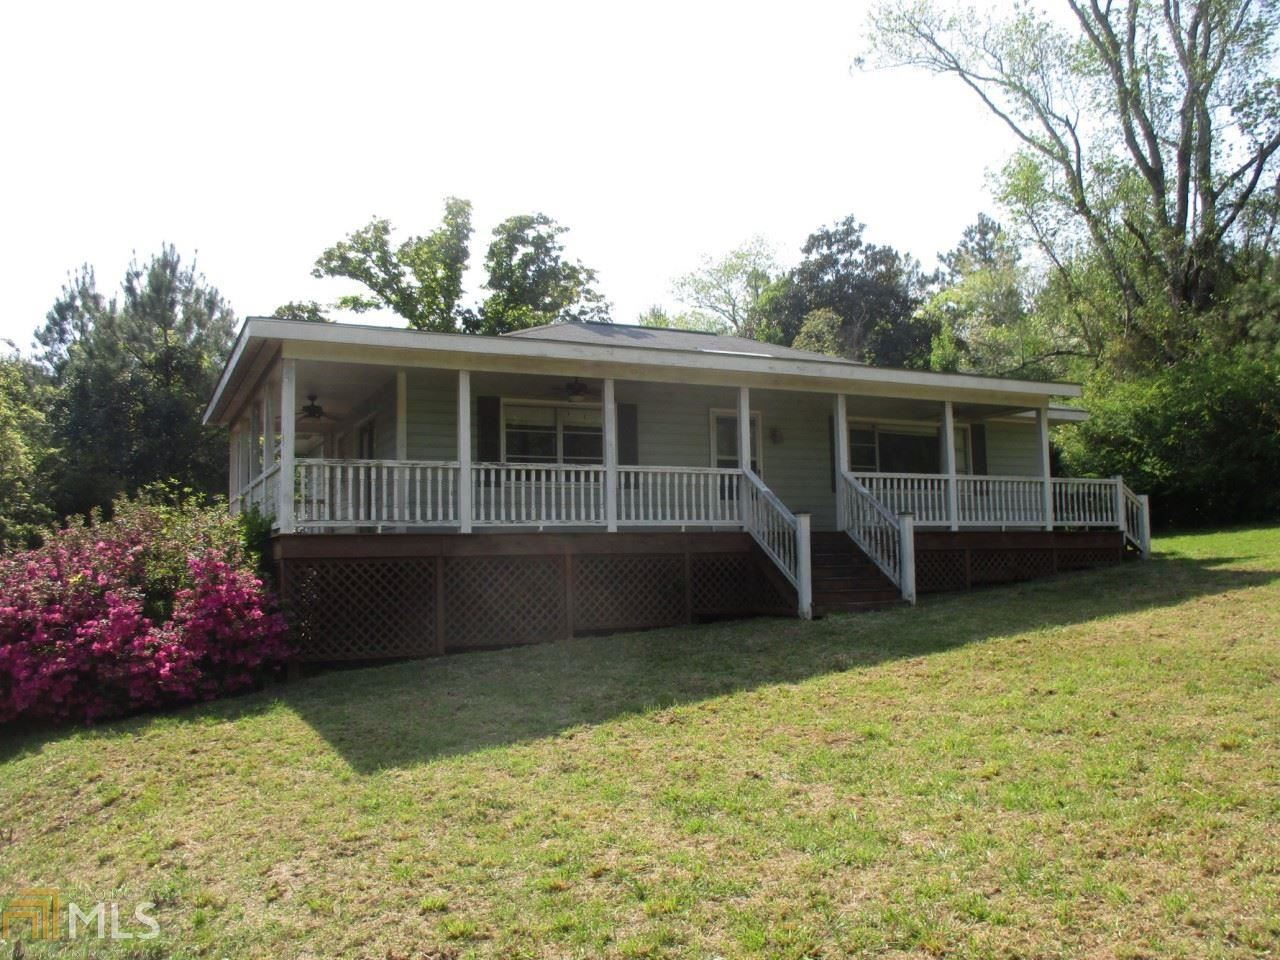 8700 Hopewell Rd, Lizella, GA 31052 - MLS#: 8959196